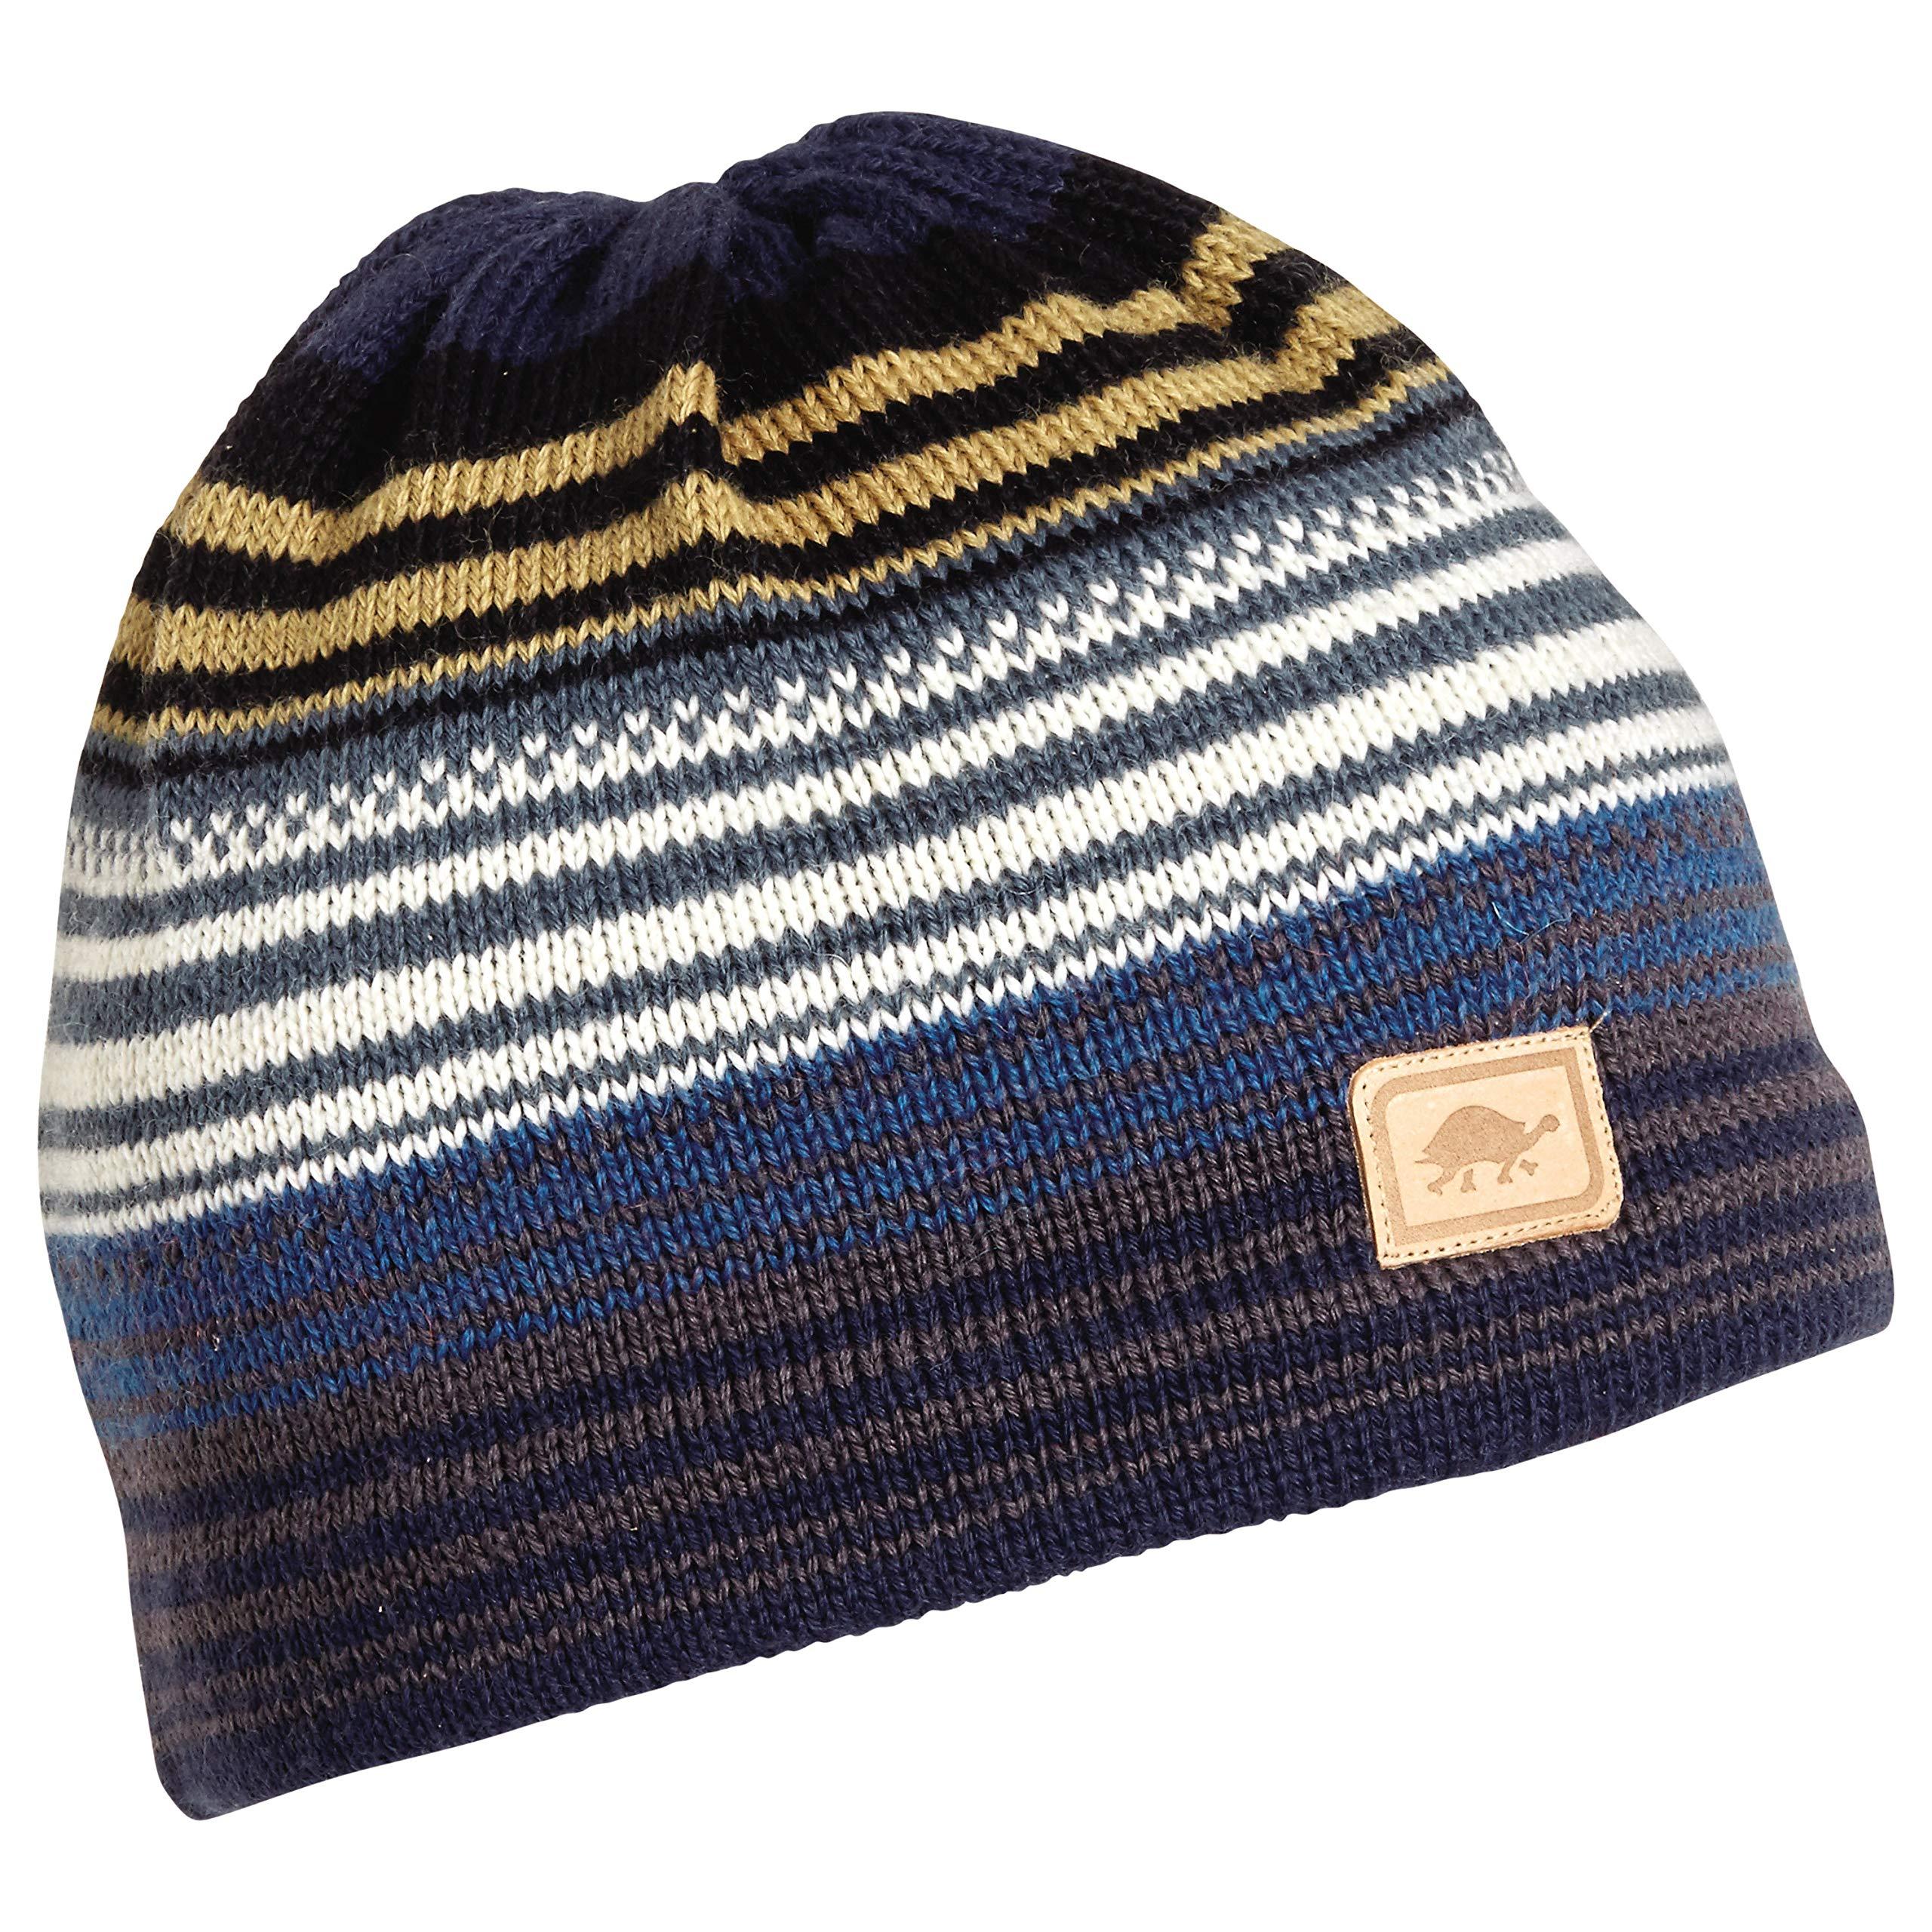 Turtle Fur Aslan, 100% Wool Knit Classic Ski Hat Striped Beanie, Ink